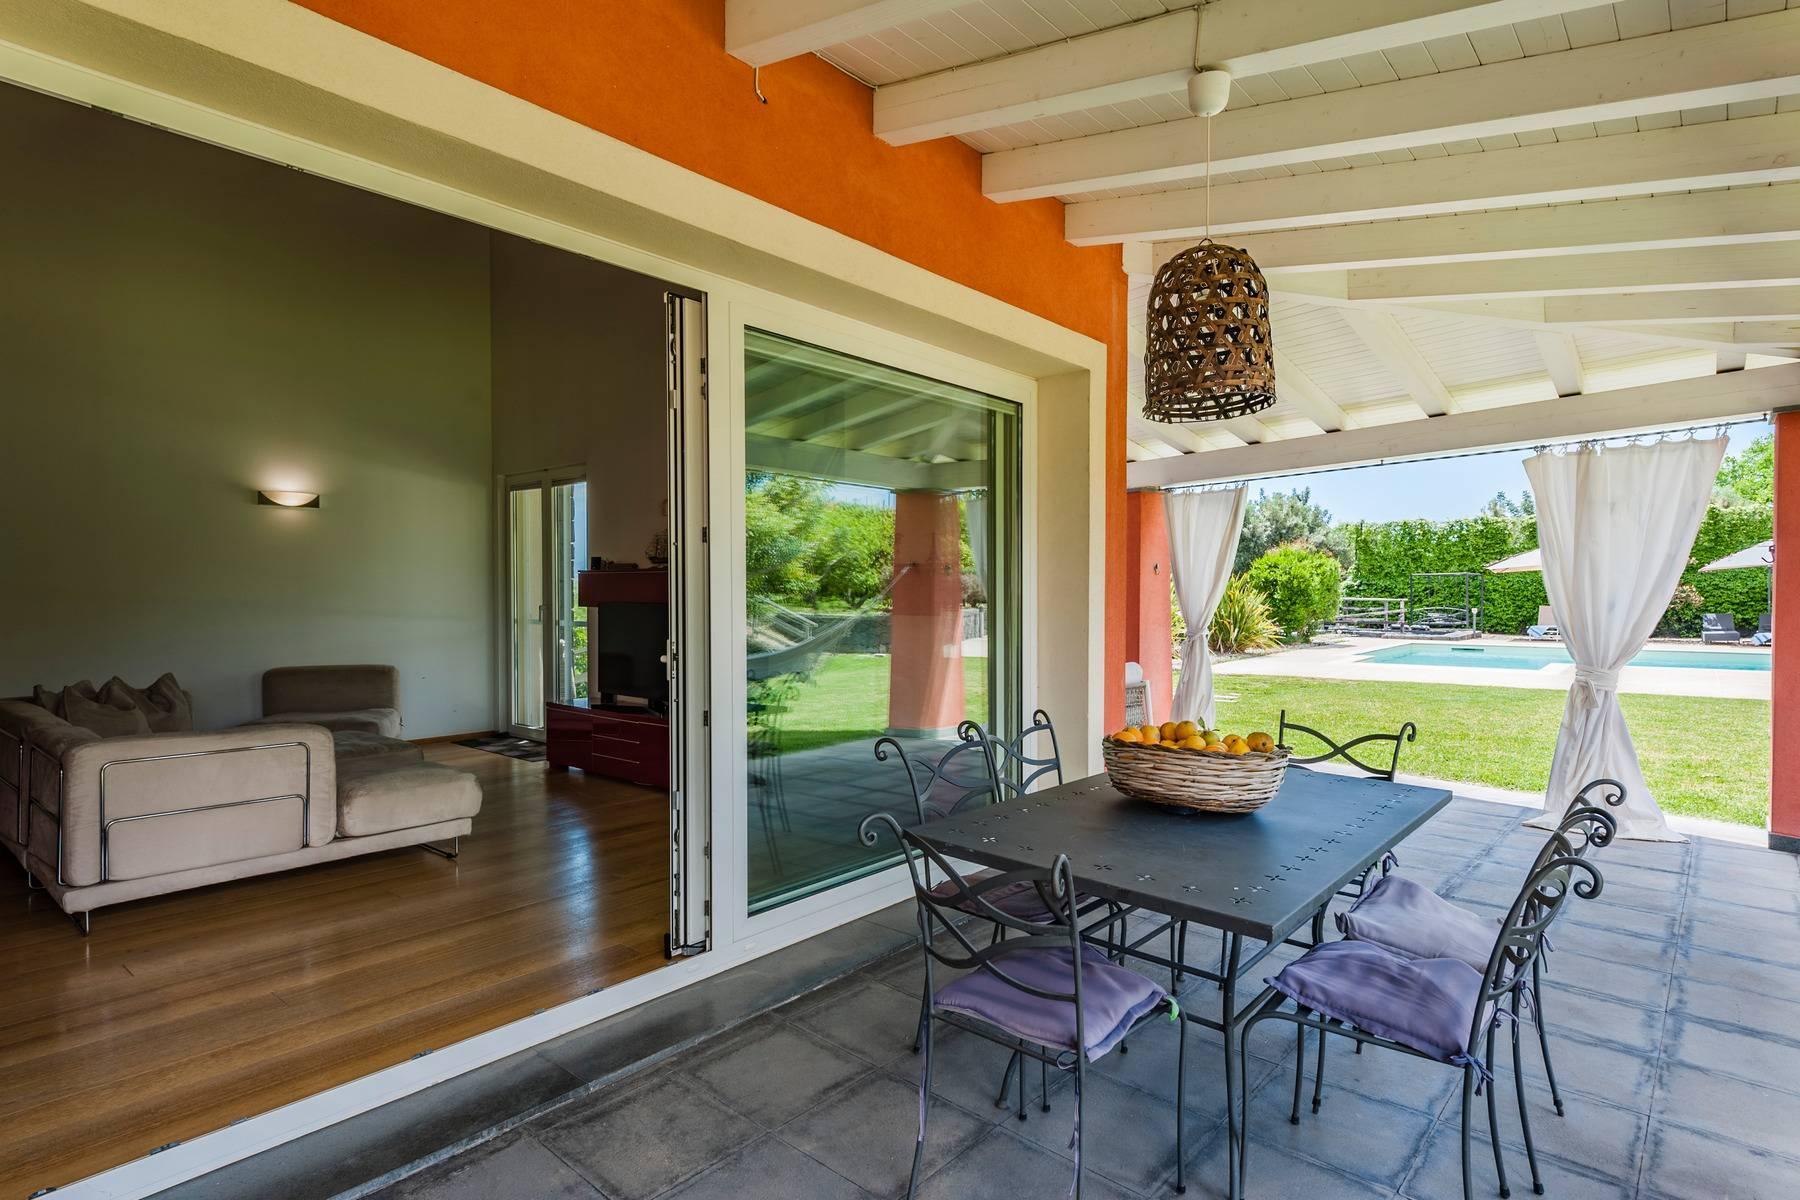 Villa esclusiva con piscina con vista ad Acireale - 4